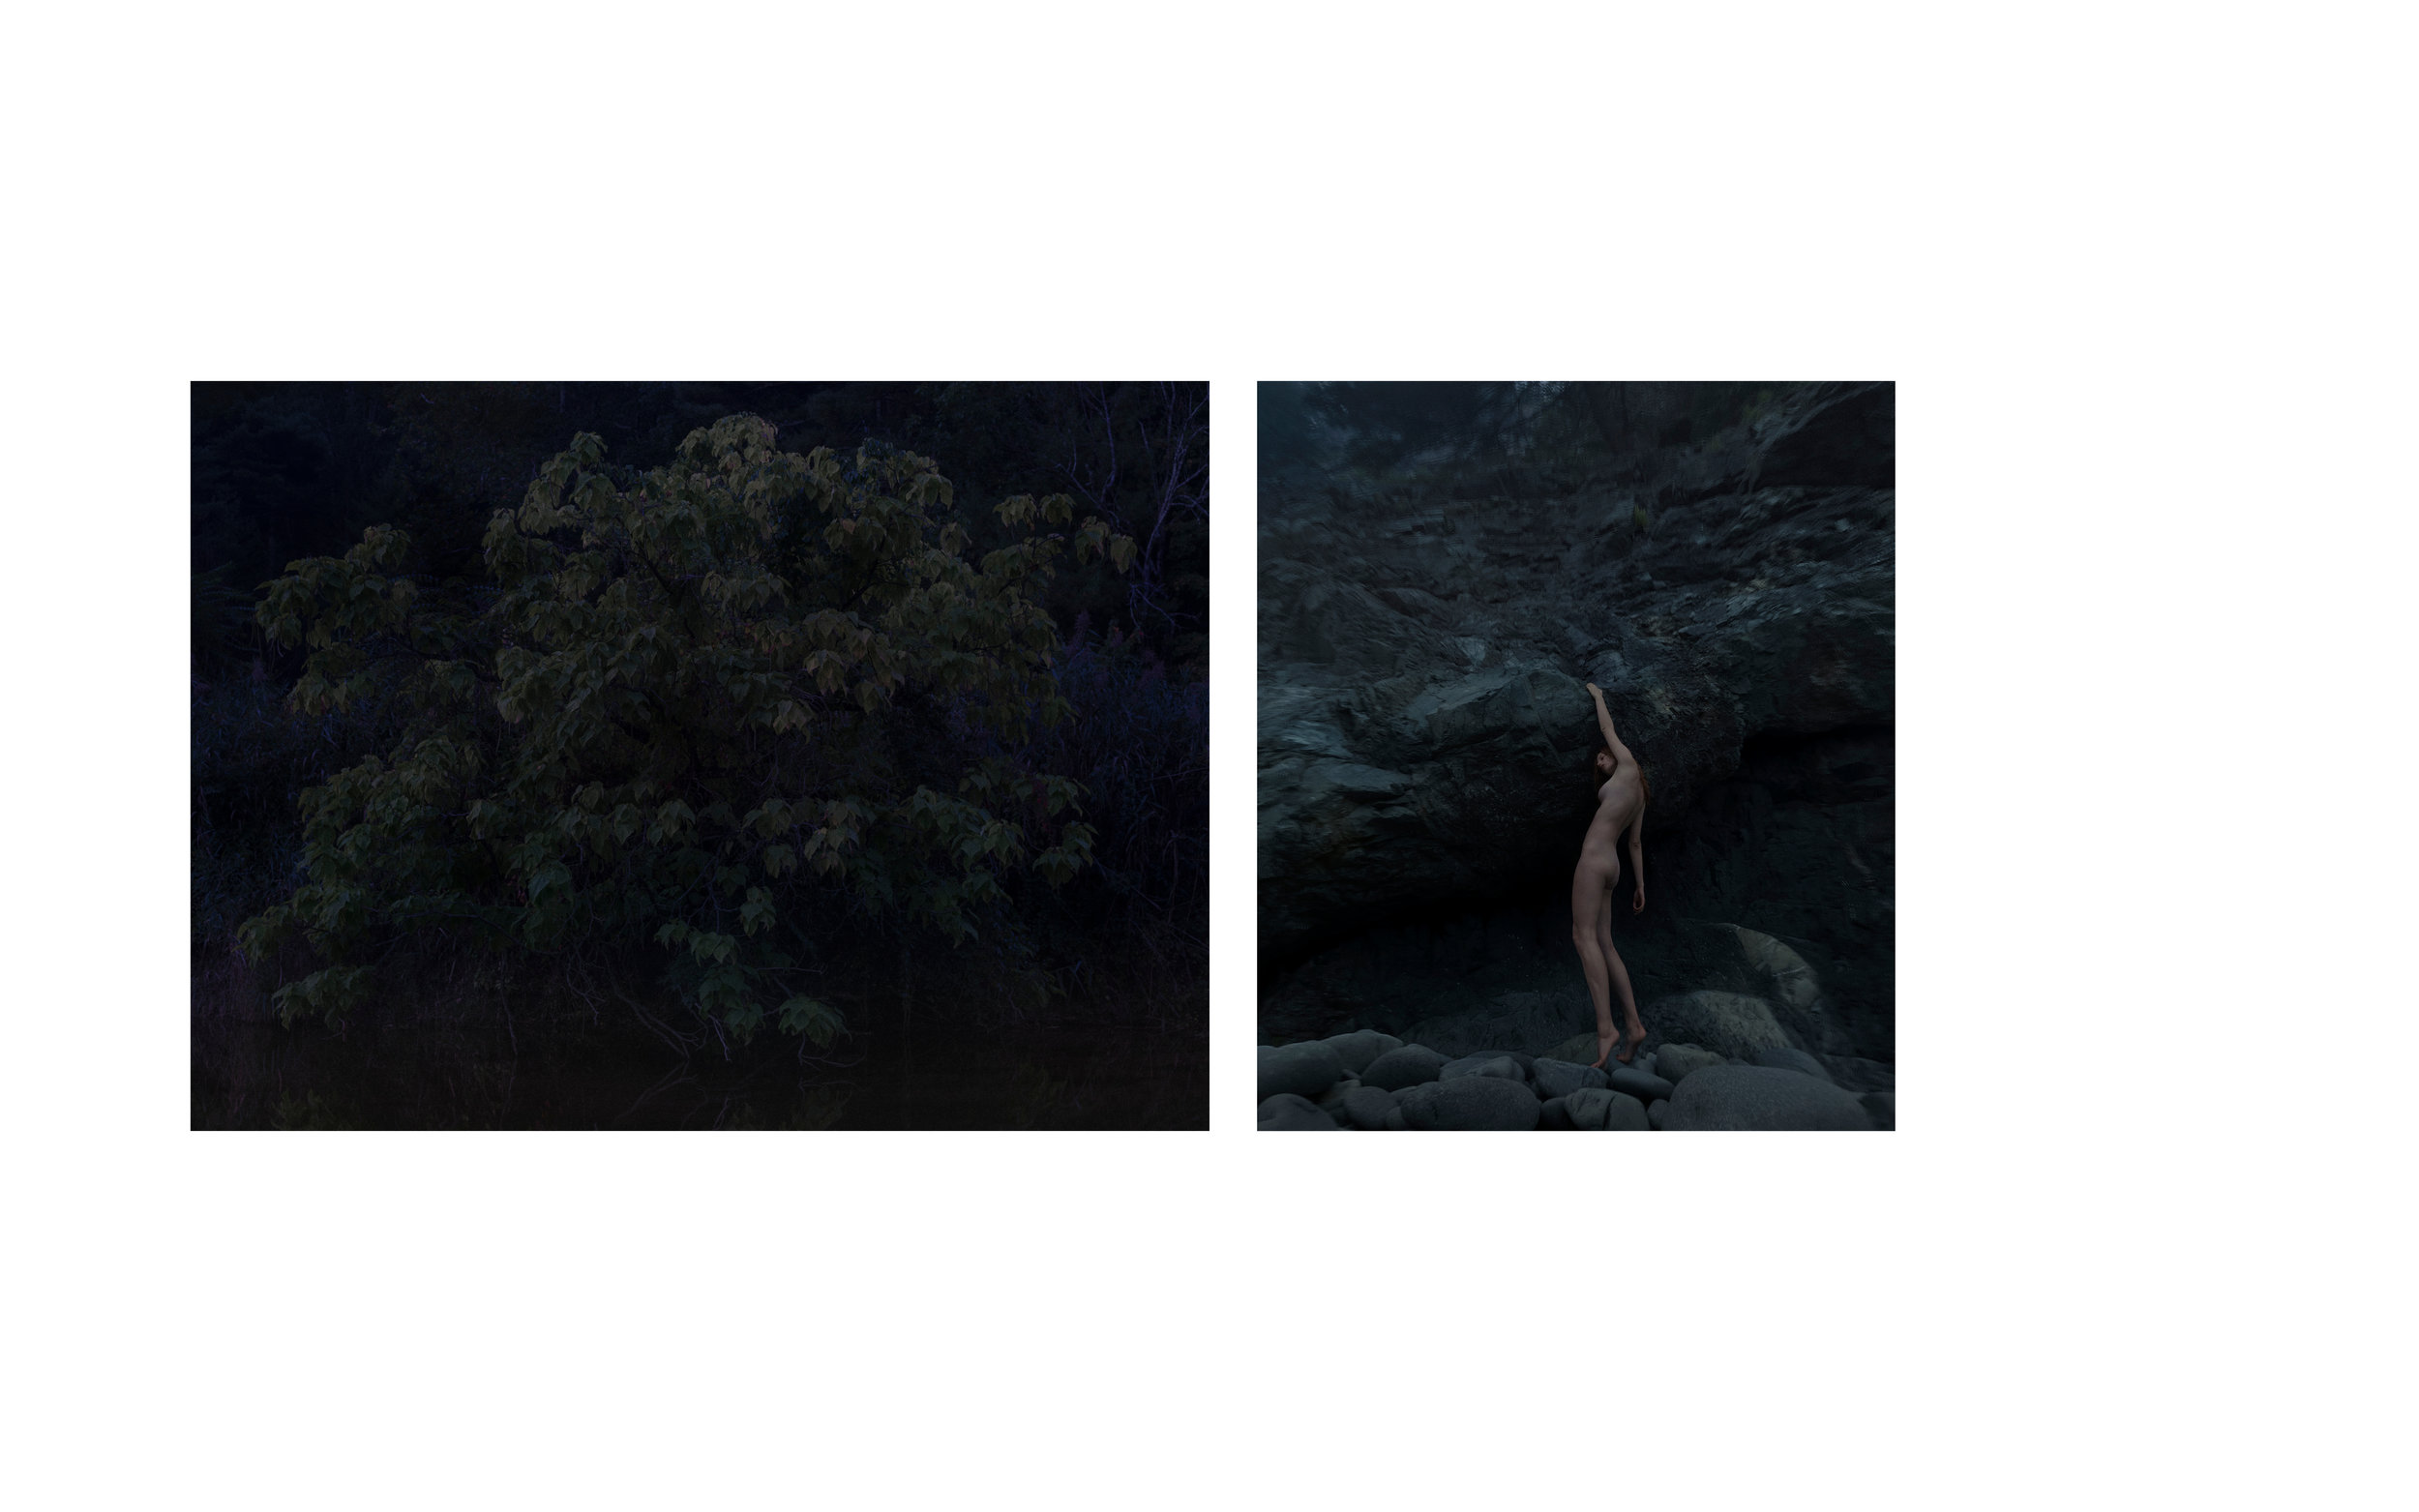 dominik_tarabanski_-_visual_conversation_-_silence_very_personal_chapter_one_8.jpg